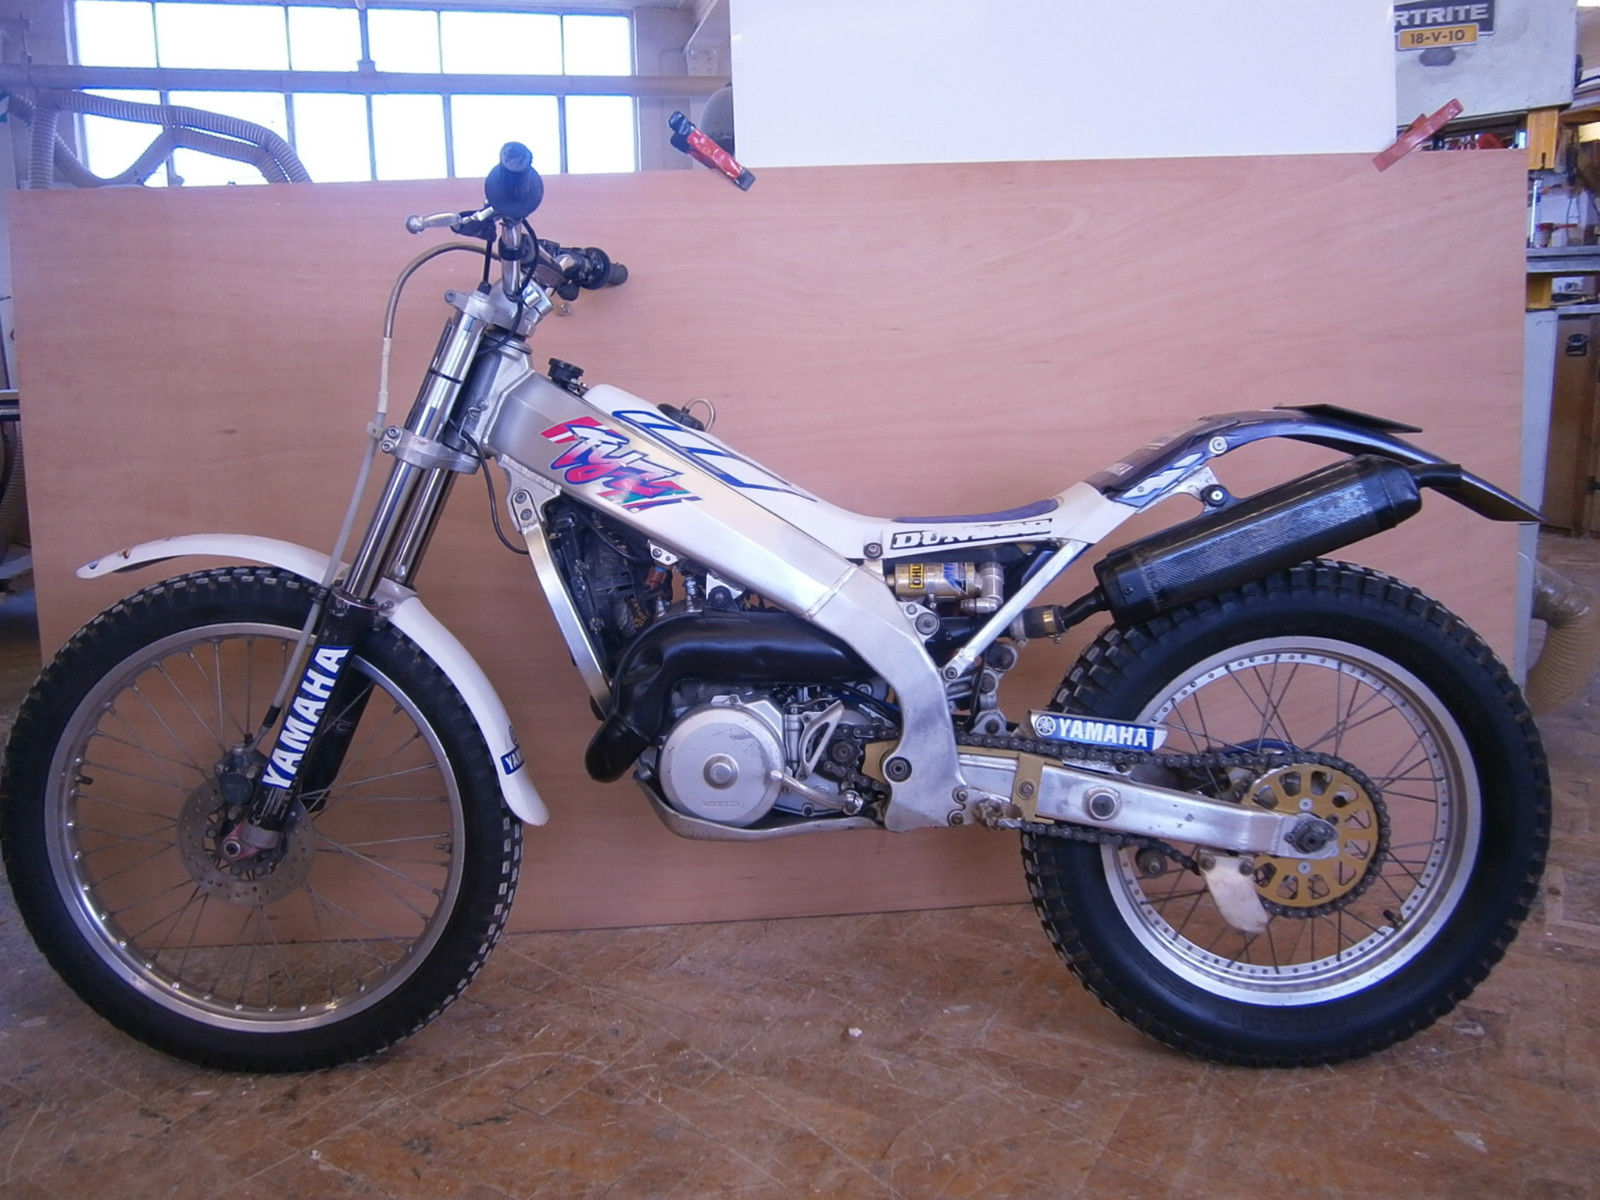 Yamaha tyz trials bike not sherco gas gas montessa beta for Yamaha trials bike